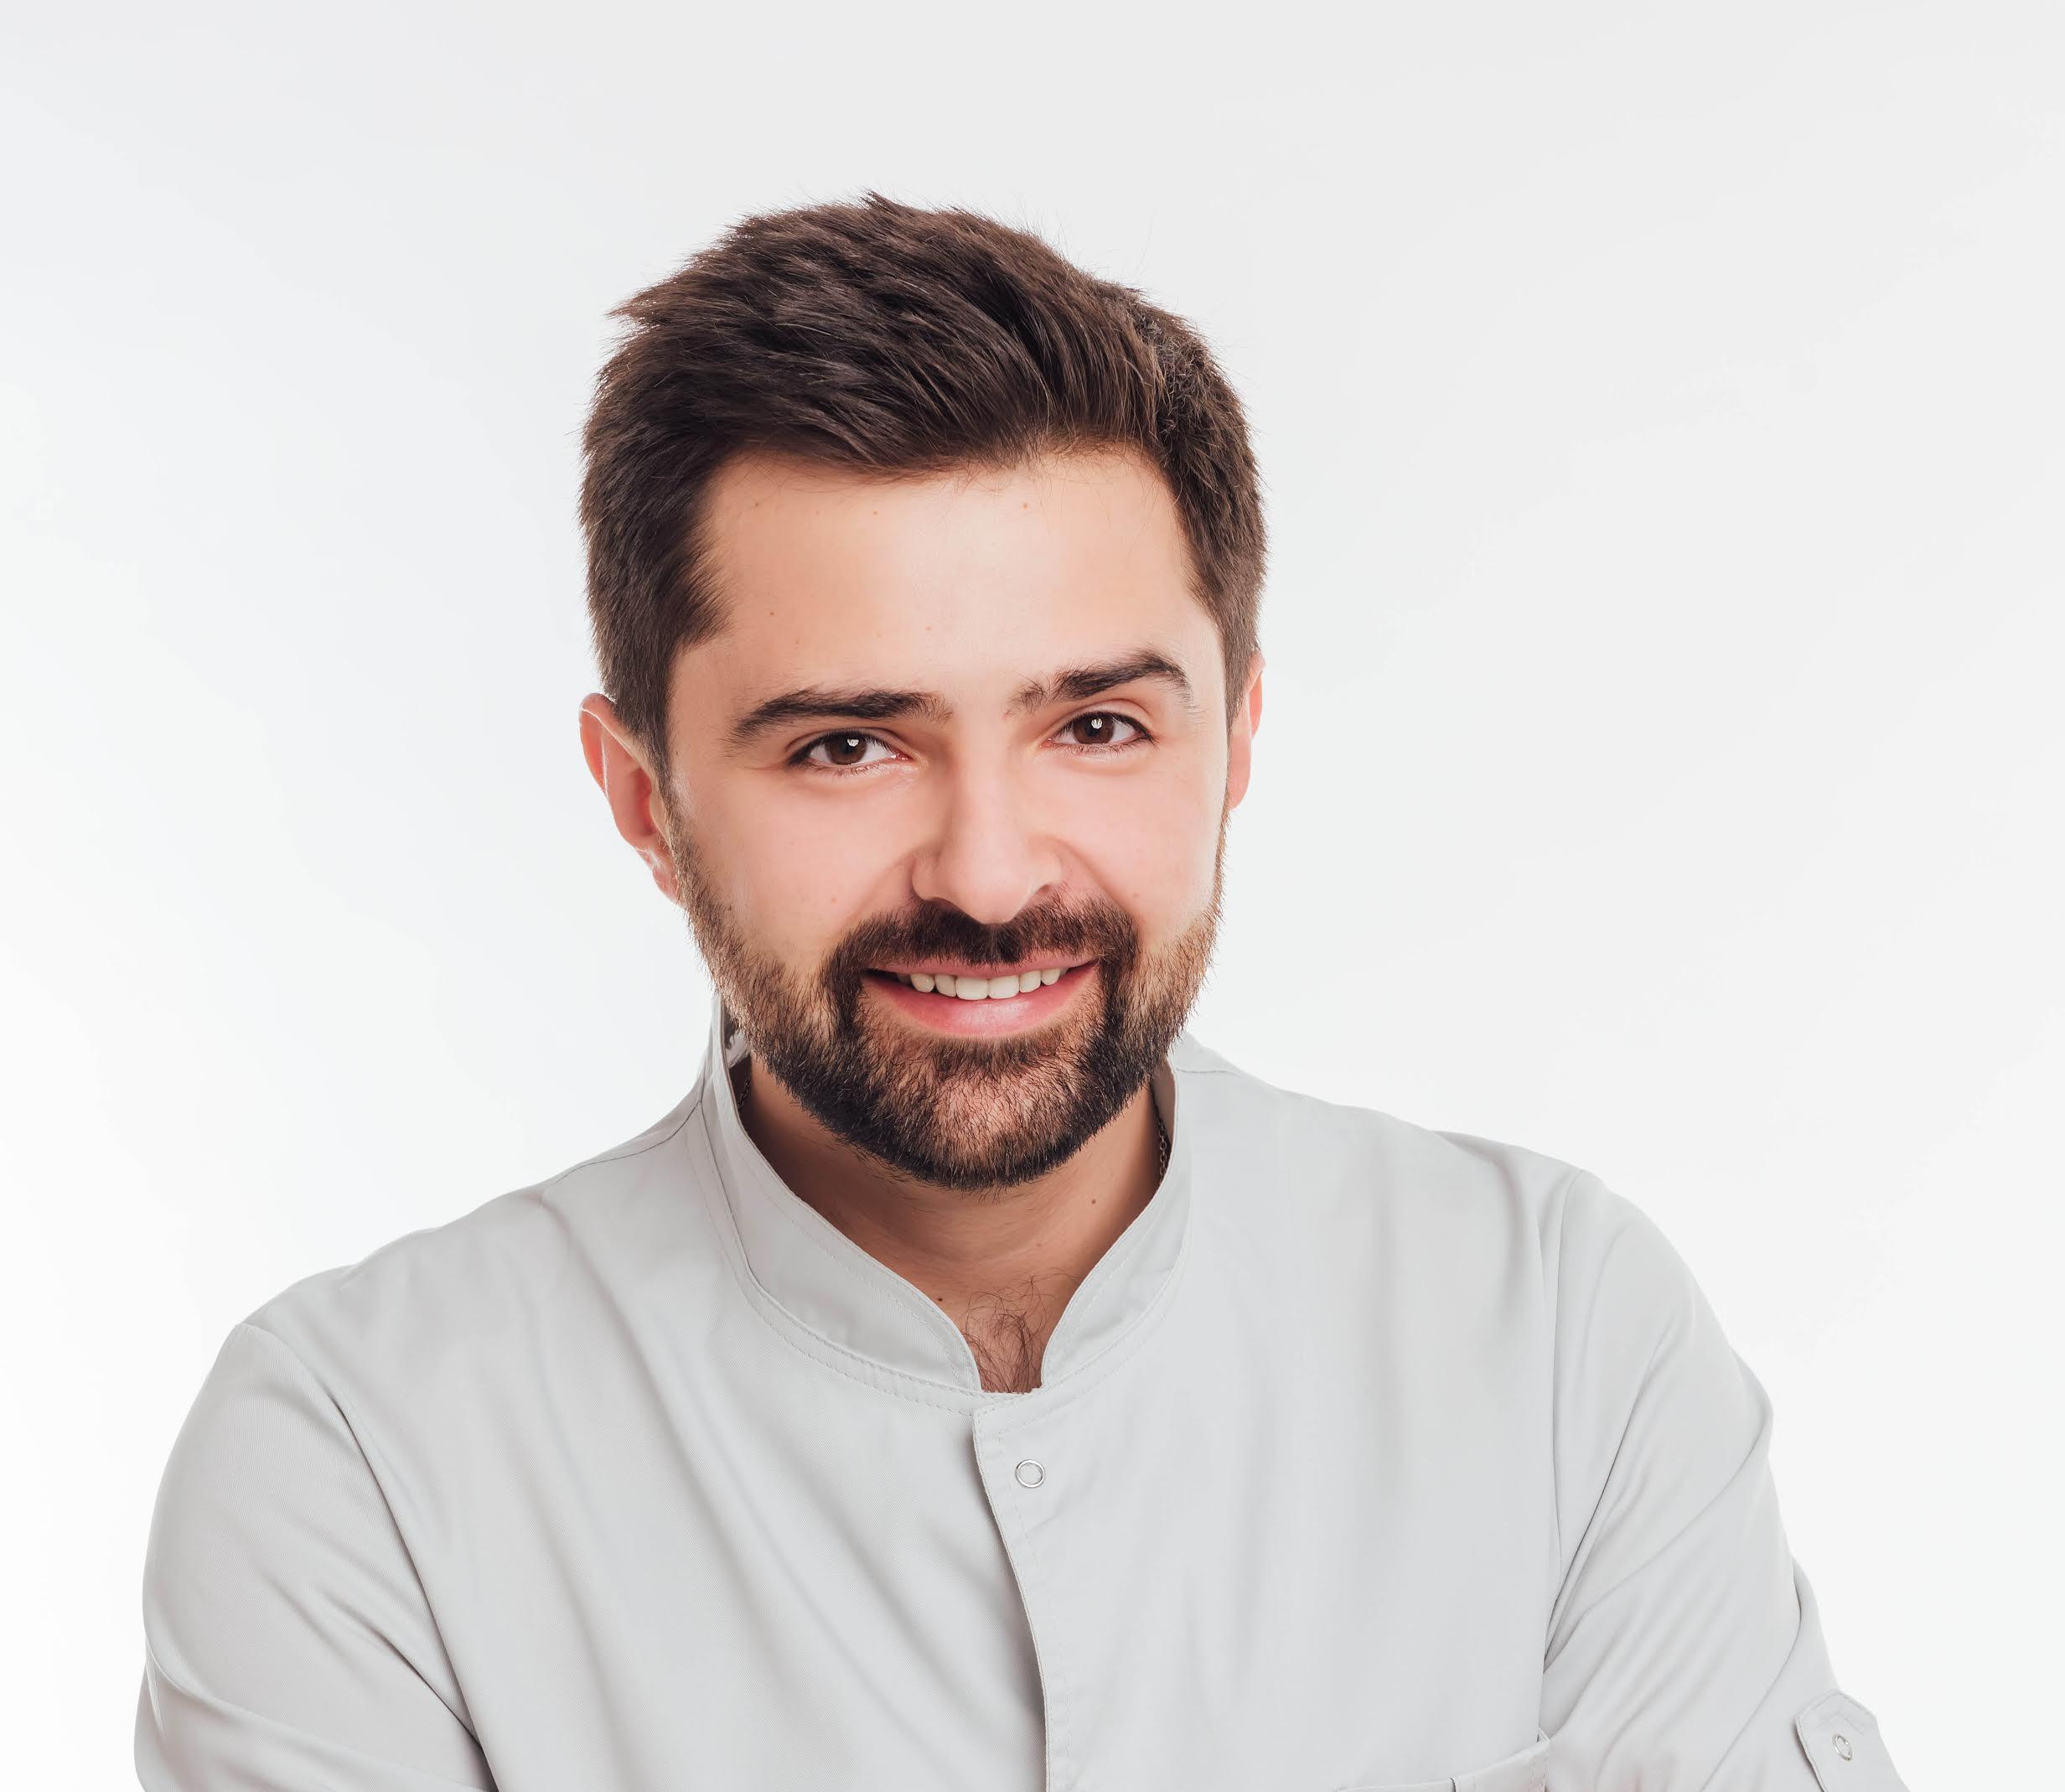 Андрій Якобчук